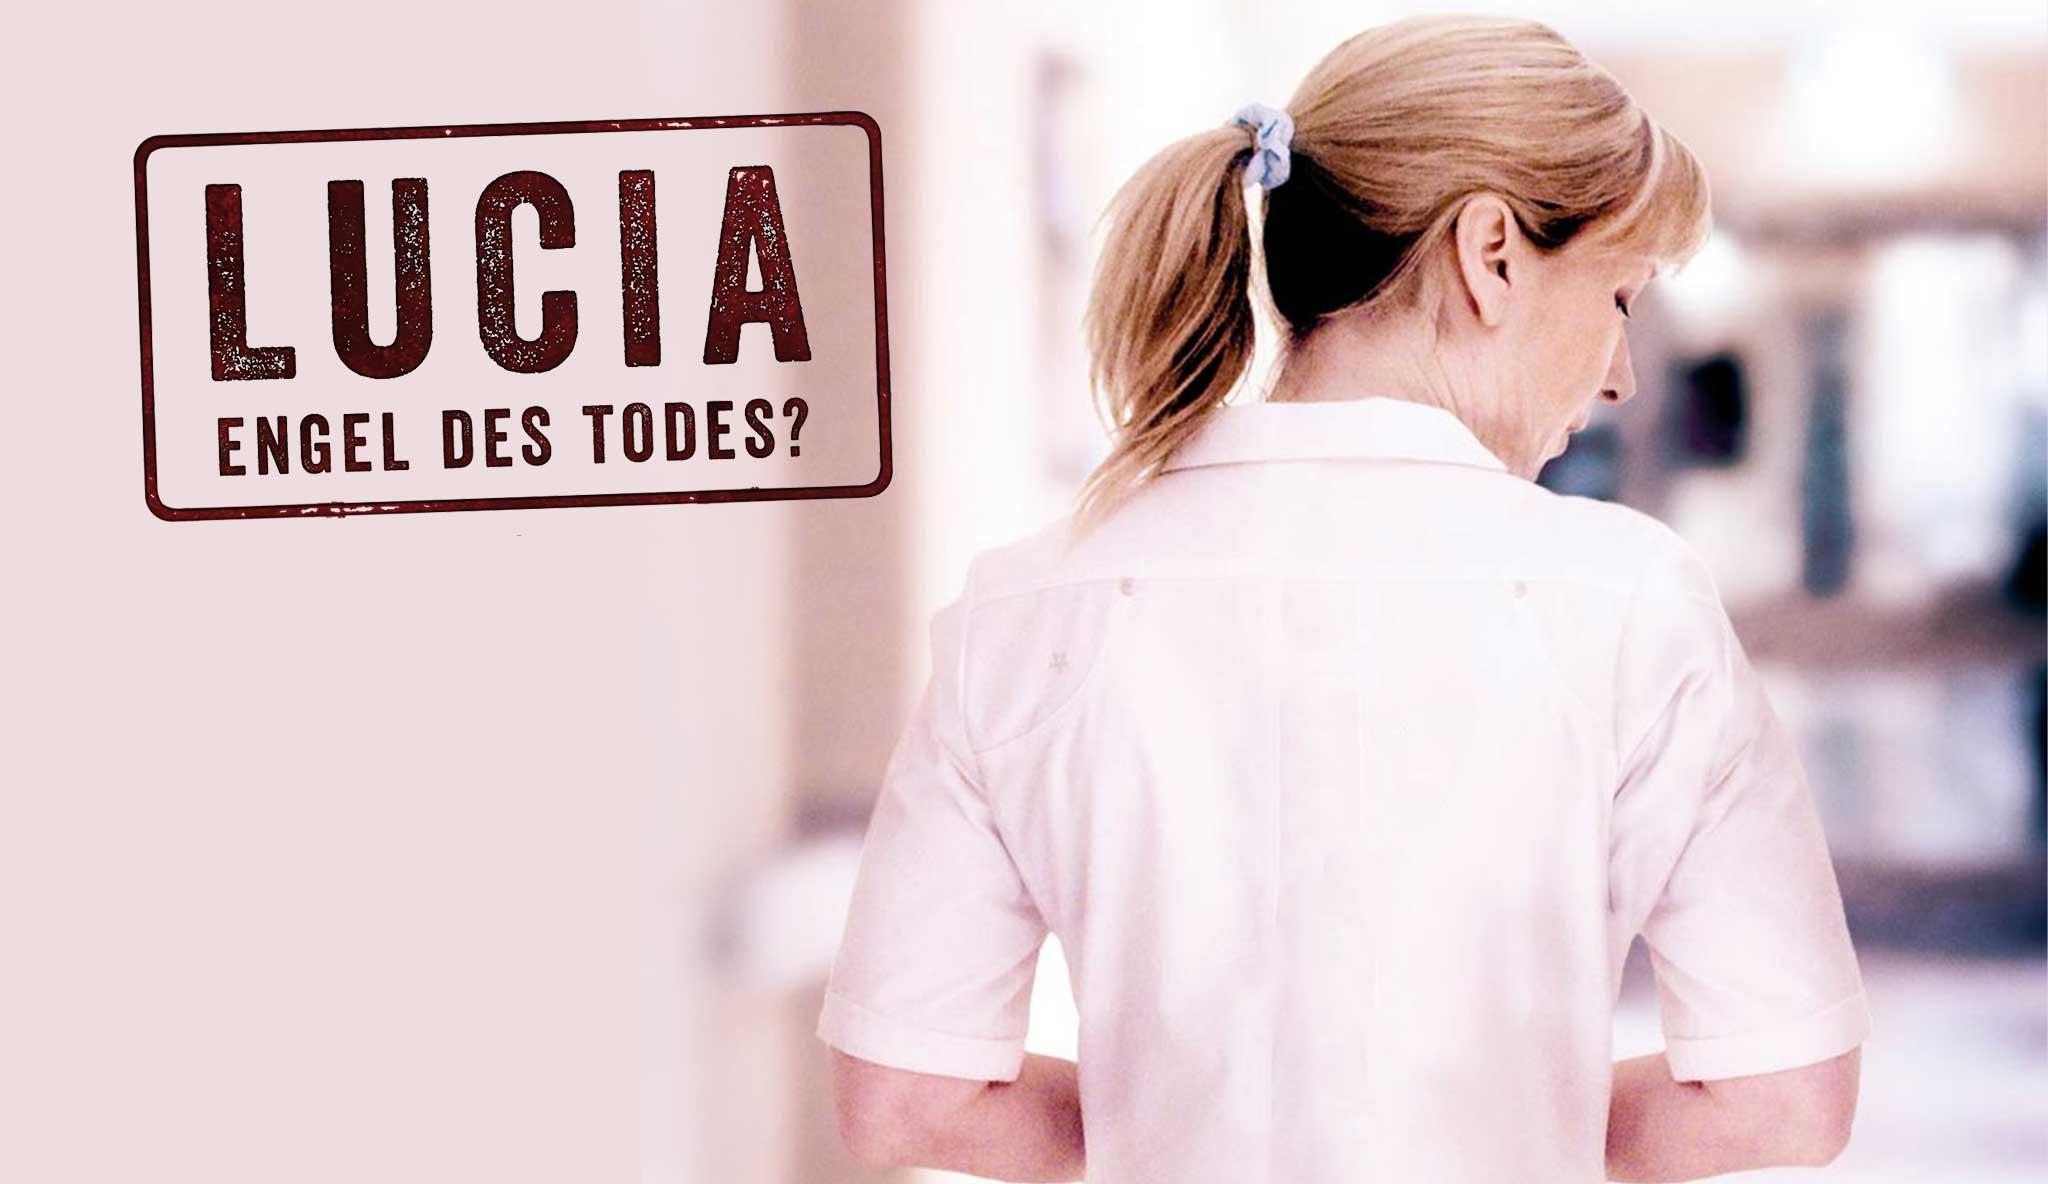 lucia-engel-des-todes\header.jpg